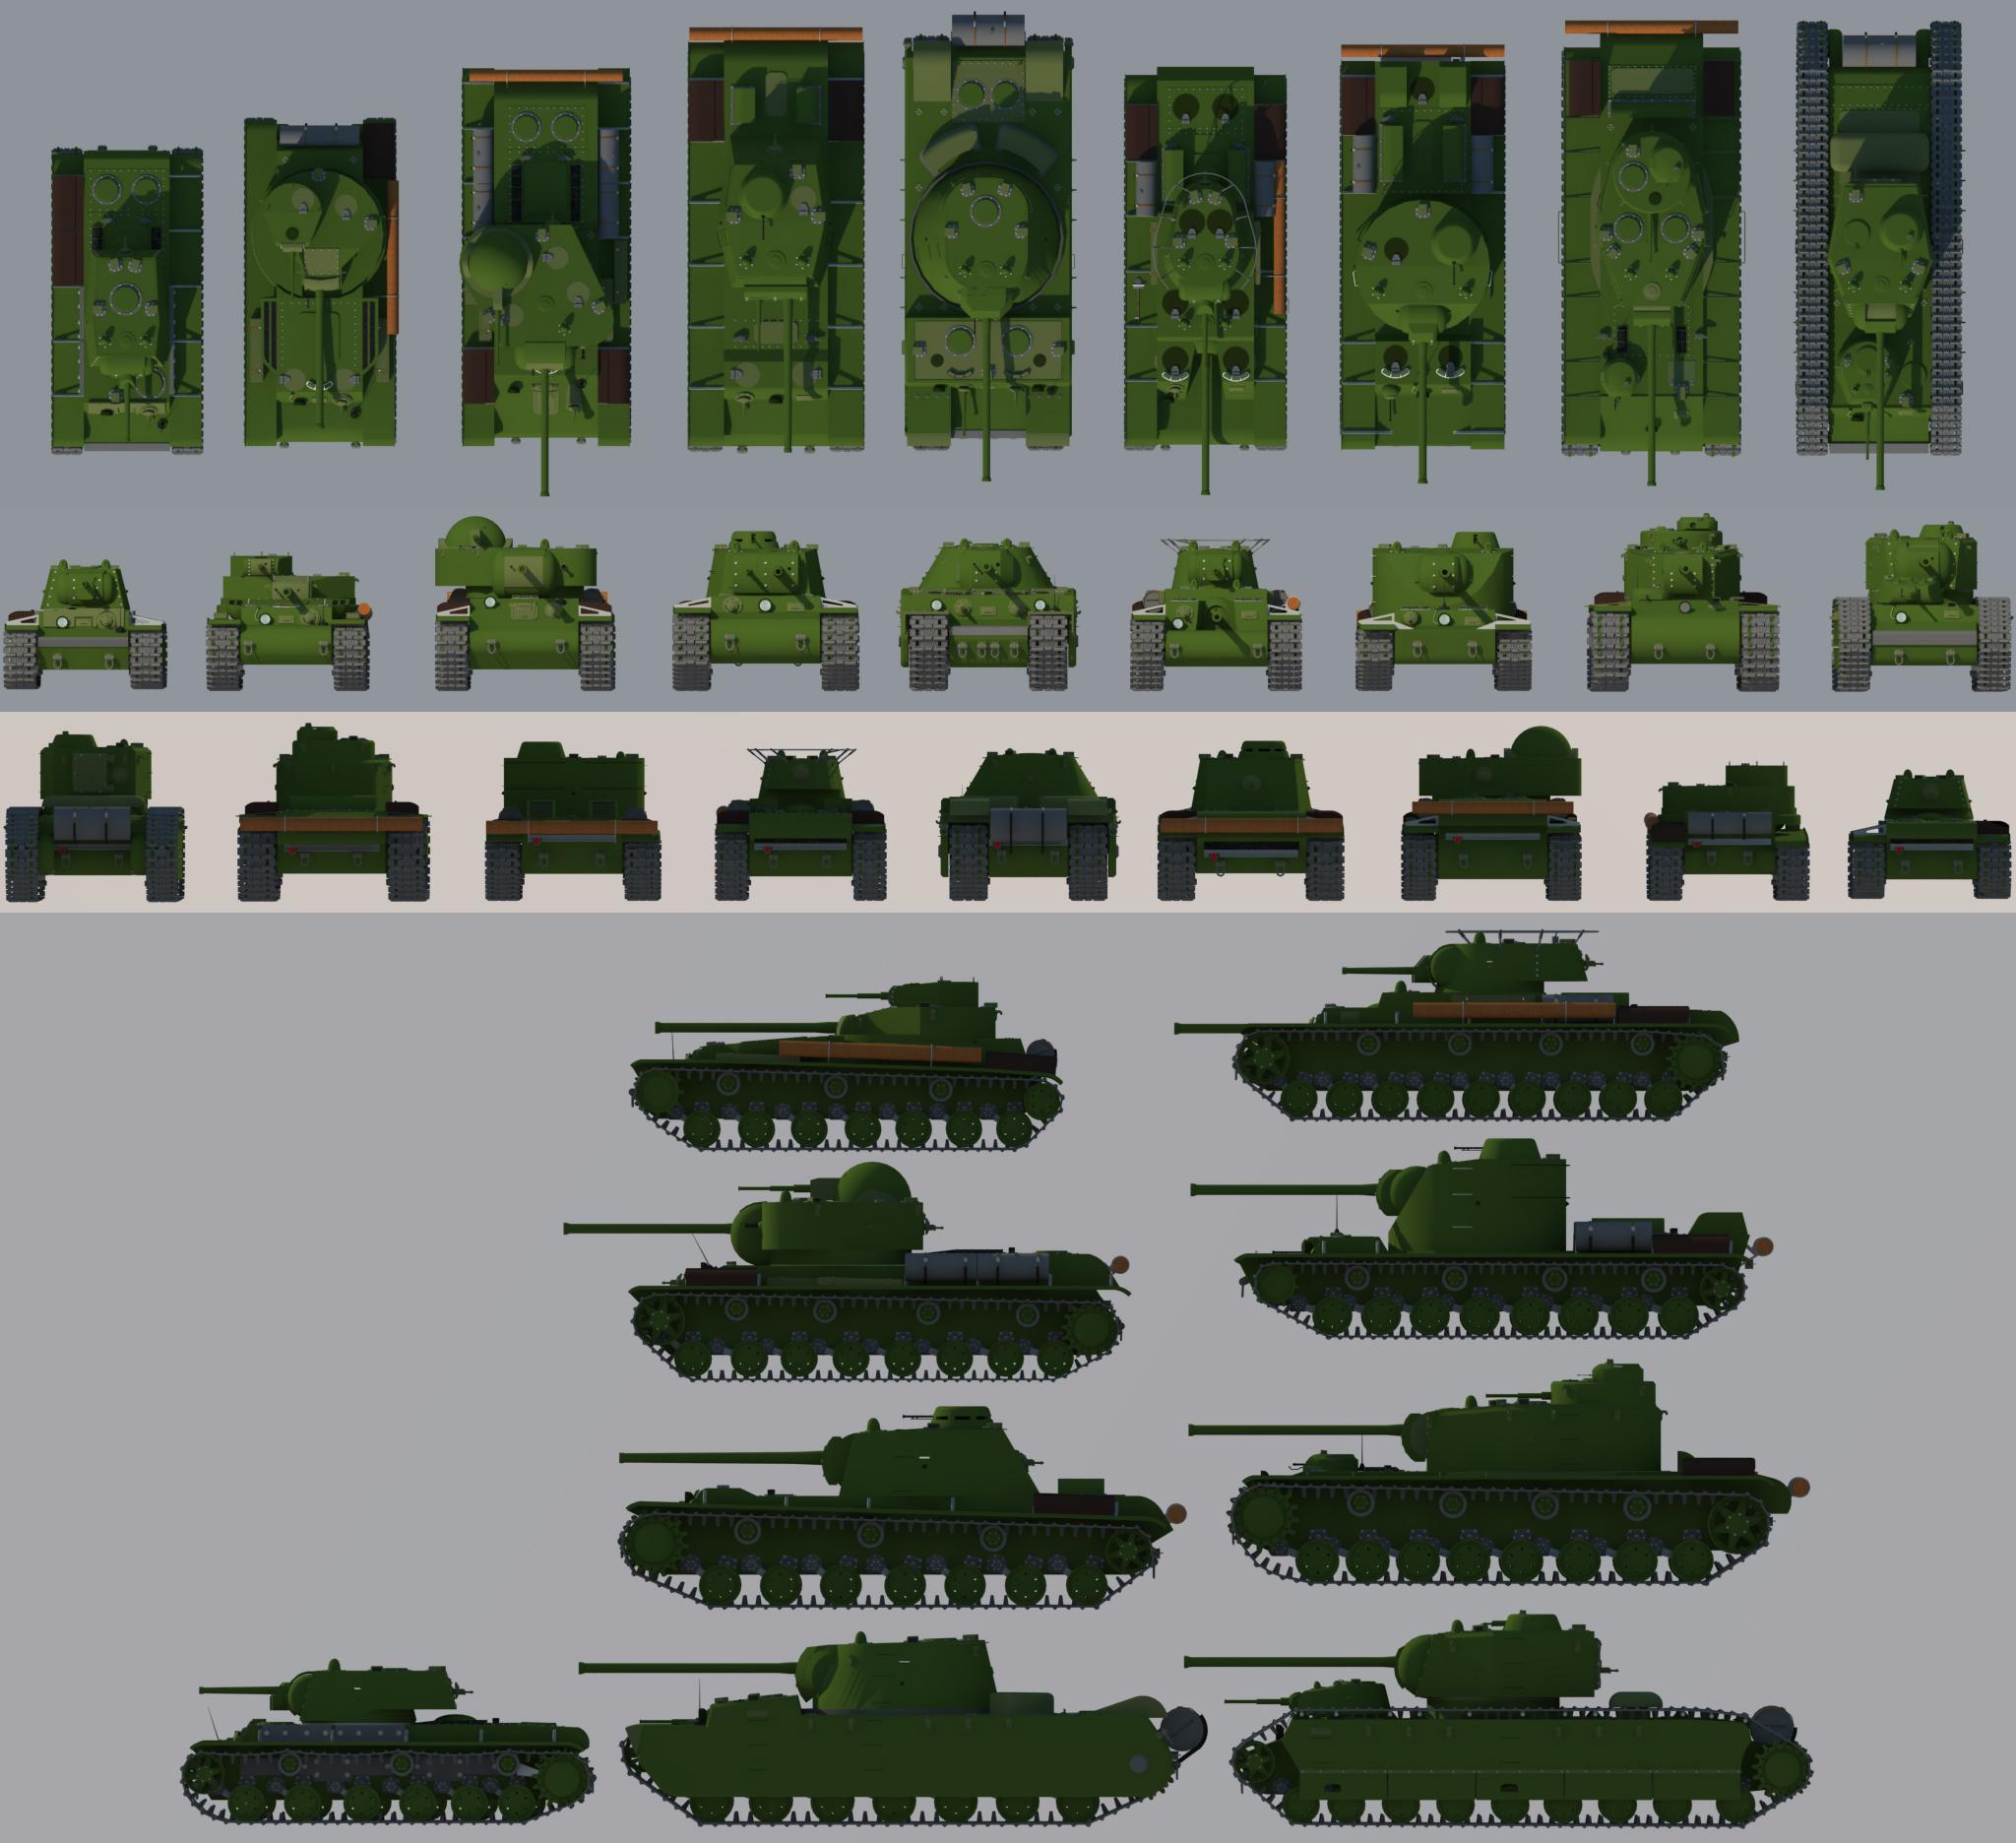 KV-4 collection ortho view